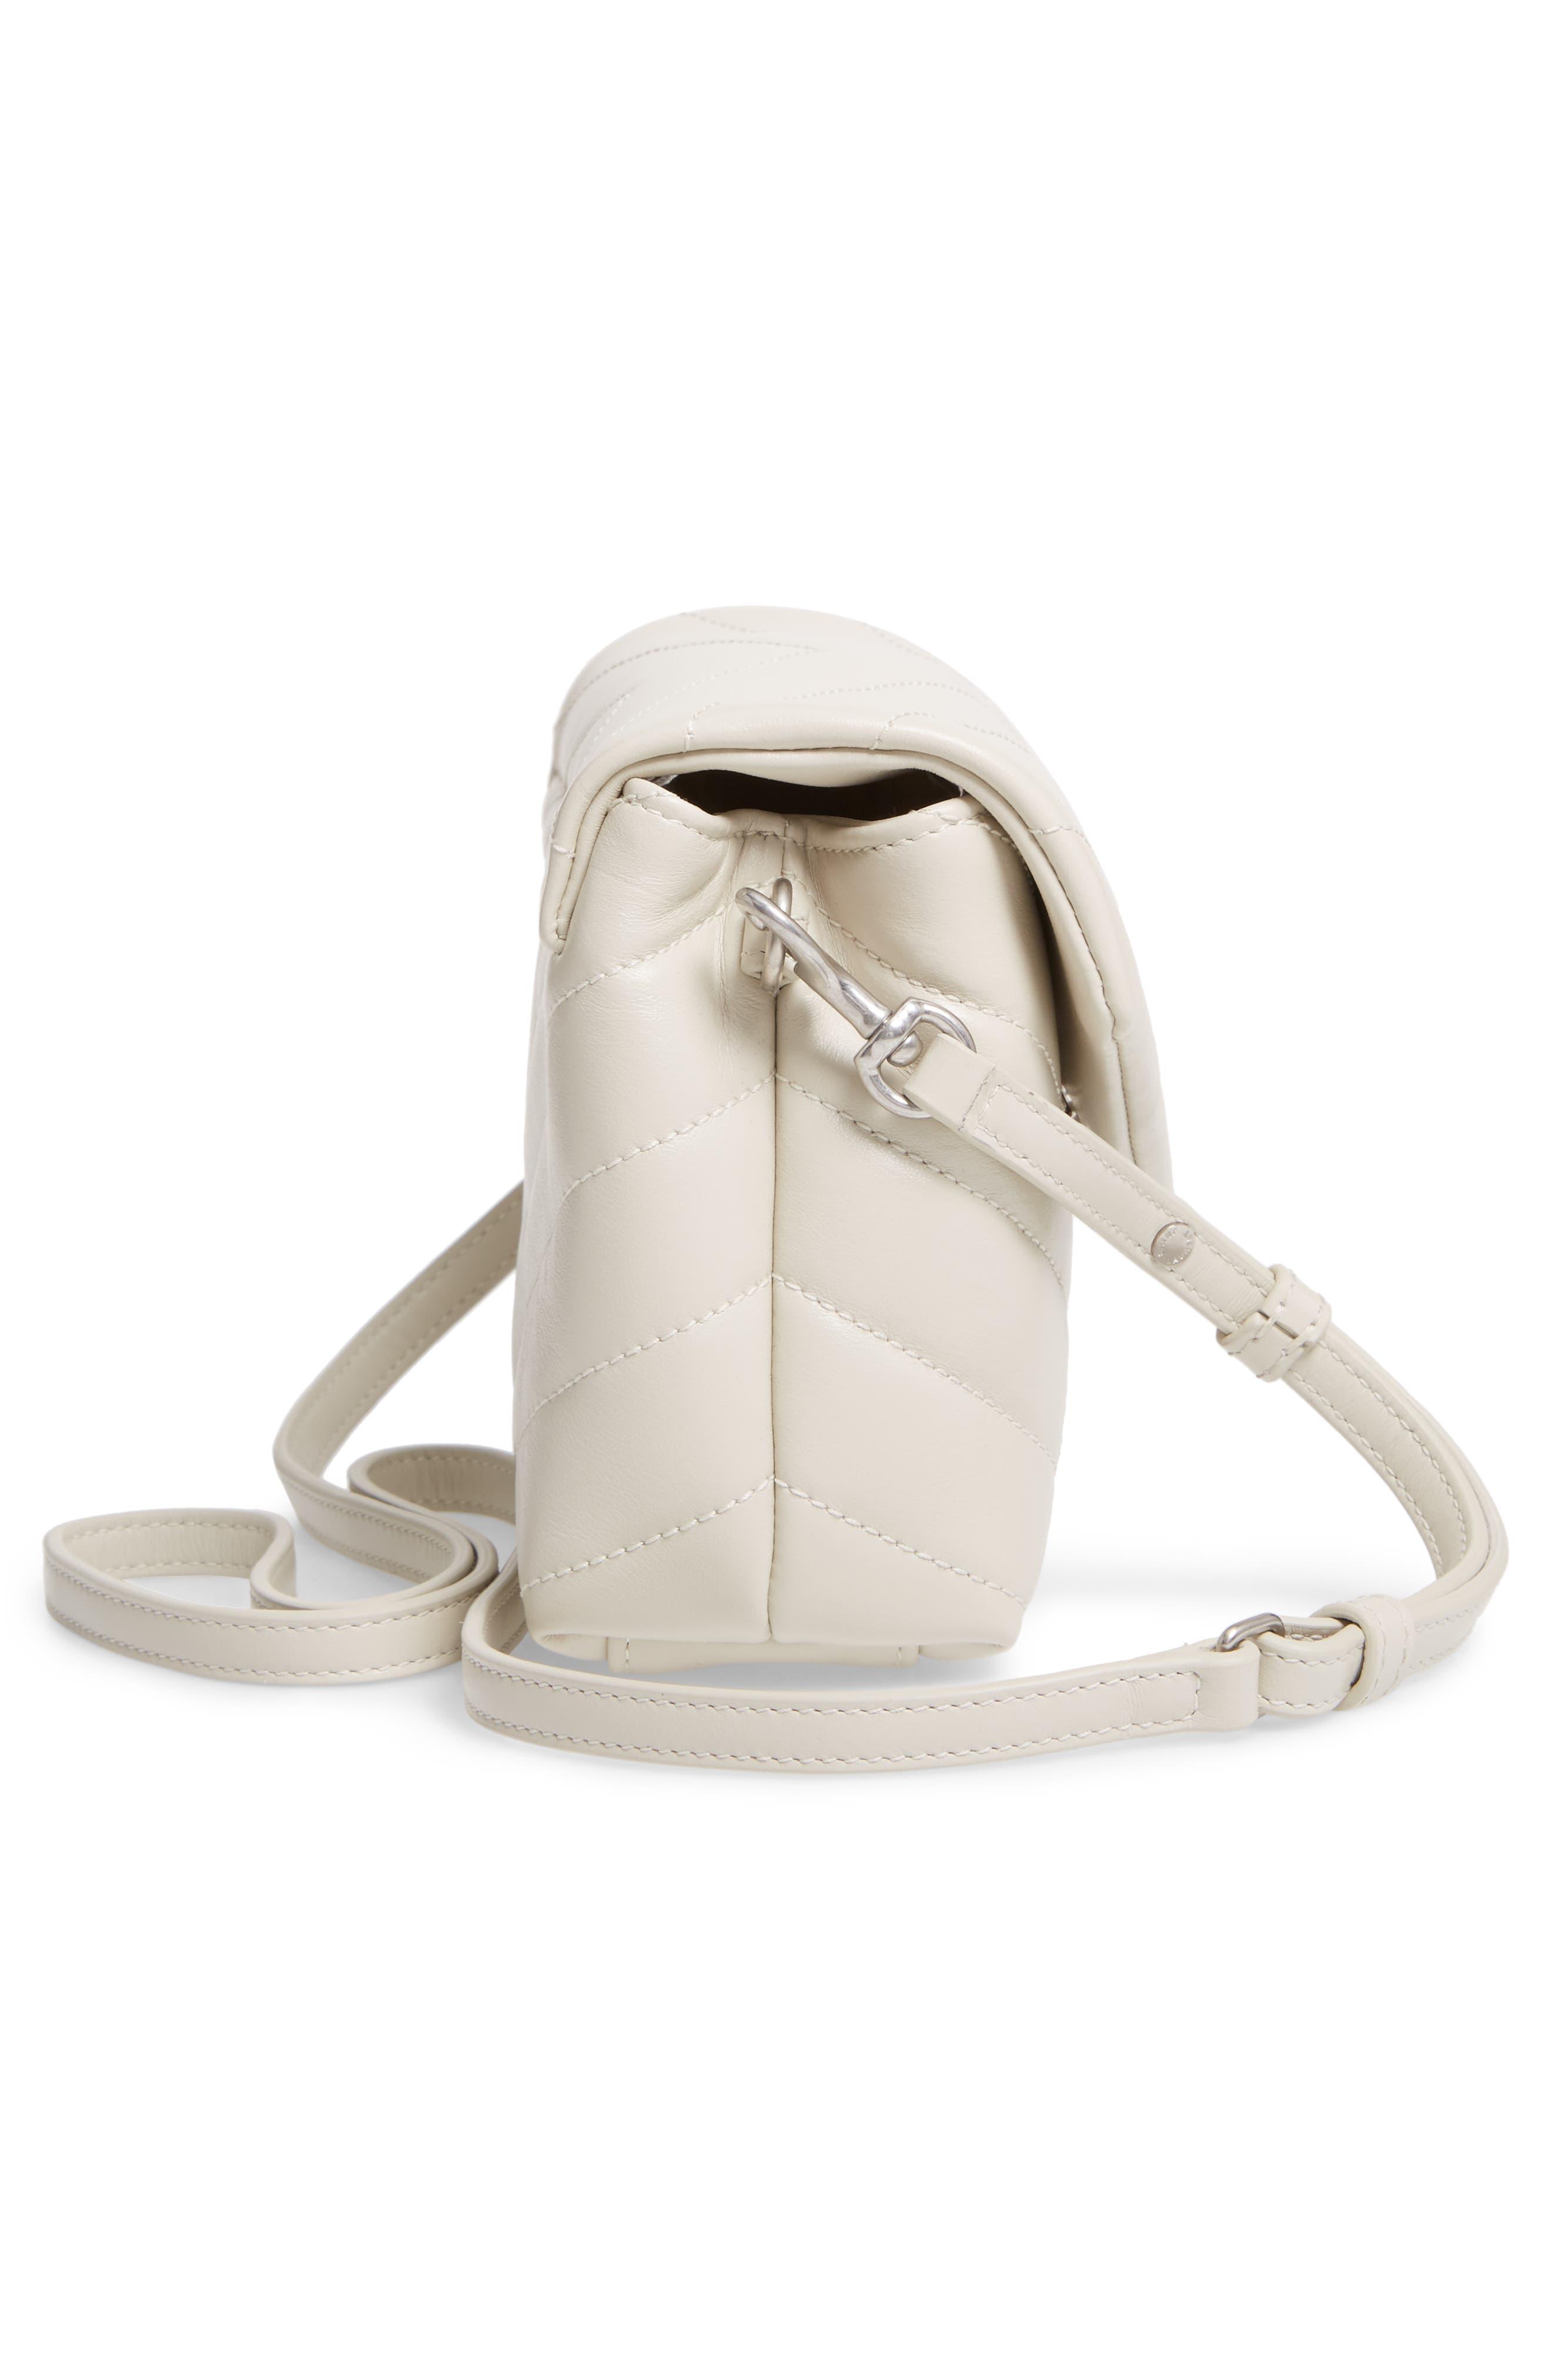 SAINT LAURENT, Toy Loulou Calfskin Leather Crossbody Bag, Alternate thumbnail 5, color, CREMA SOFT